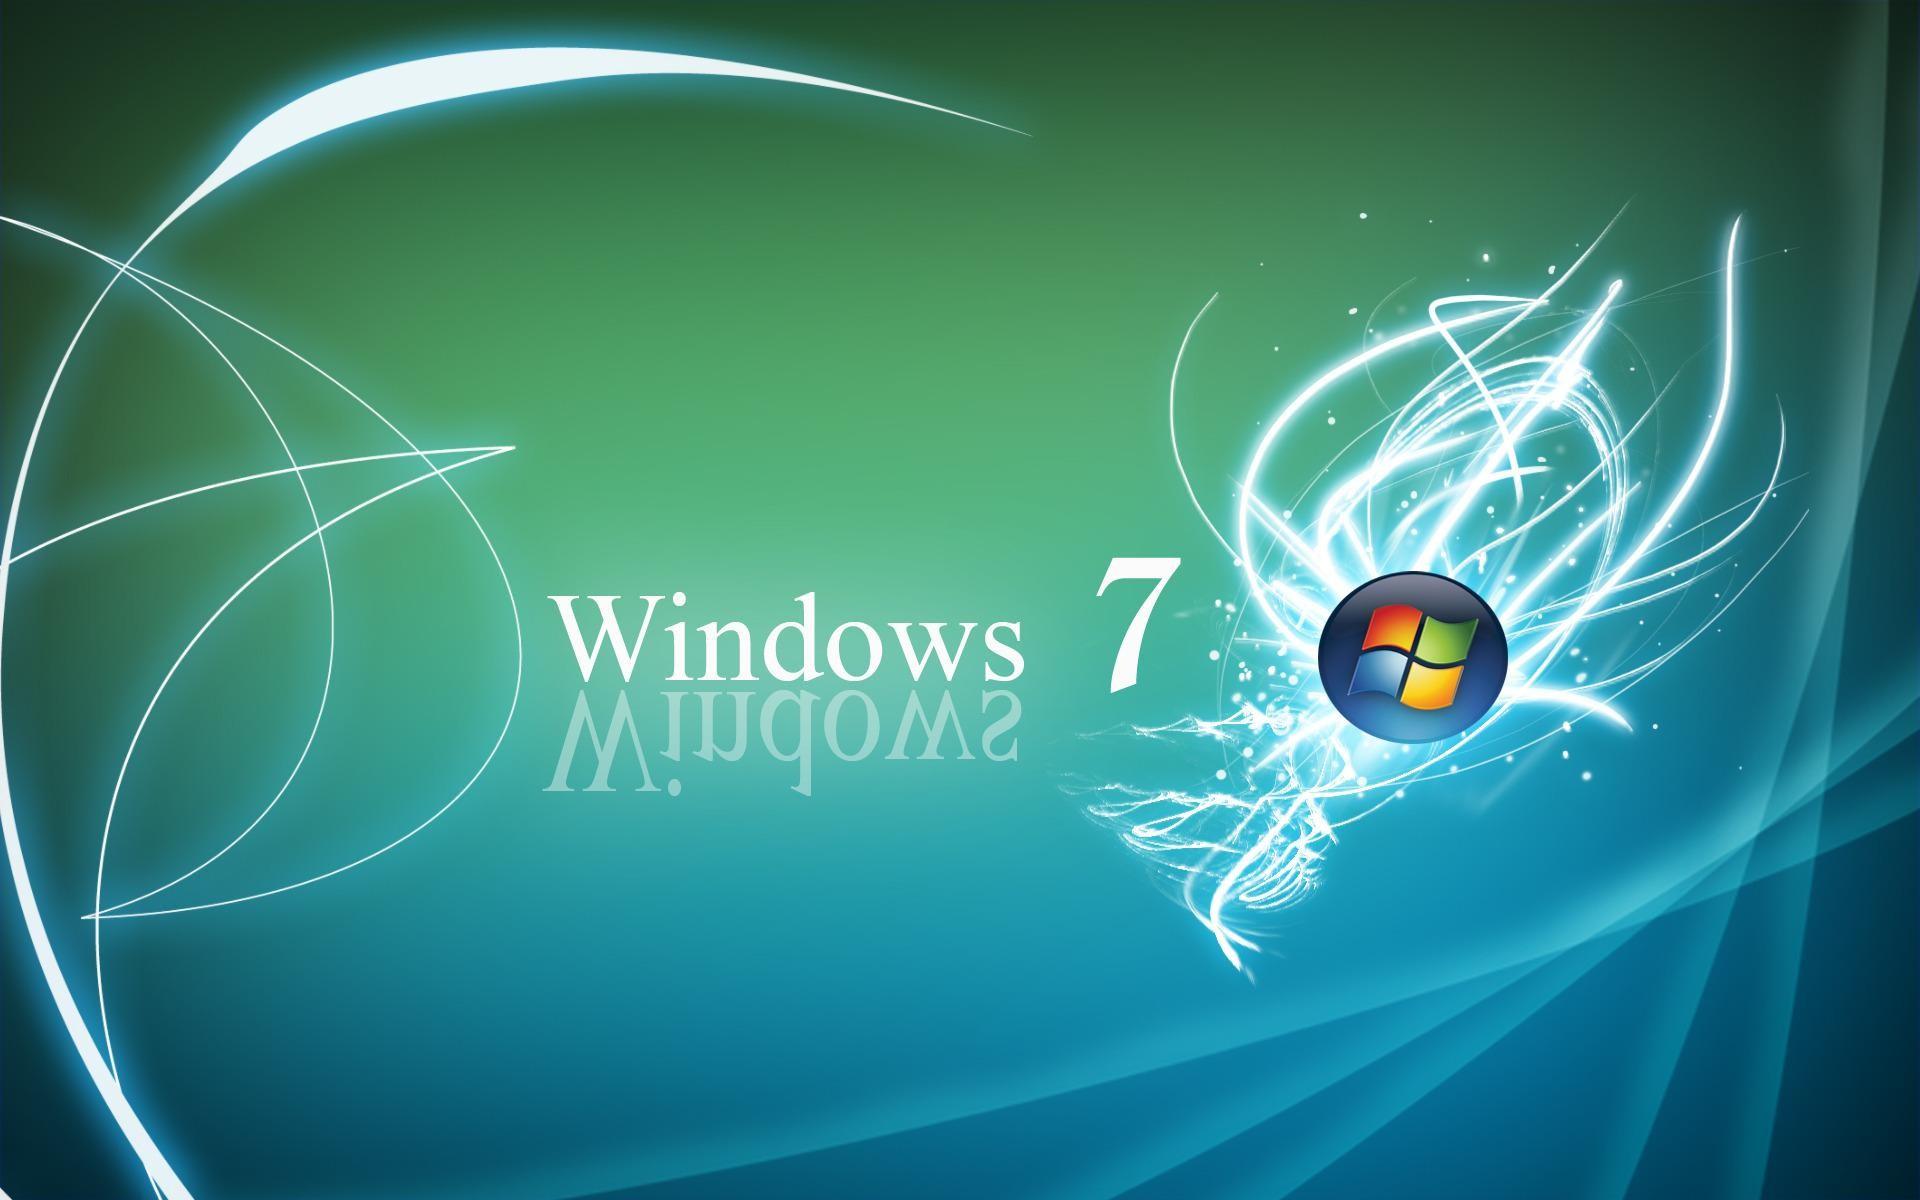 Xp Ultimate 3d Wallpaper Hd Desktop Wallpaper For Windows 7 67 Images